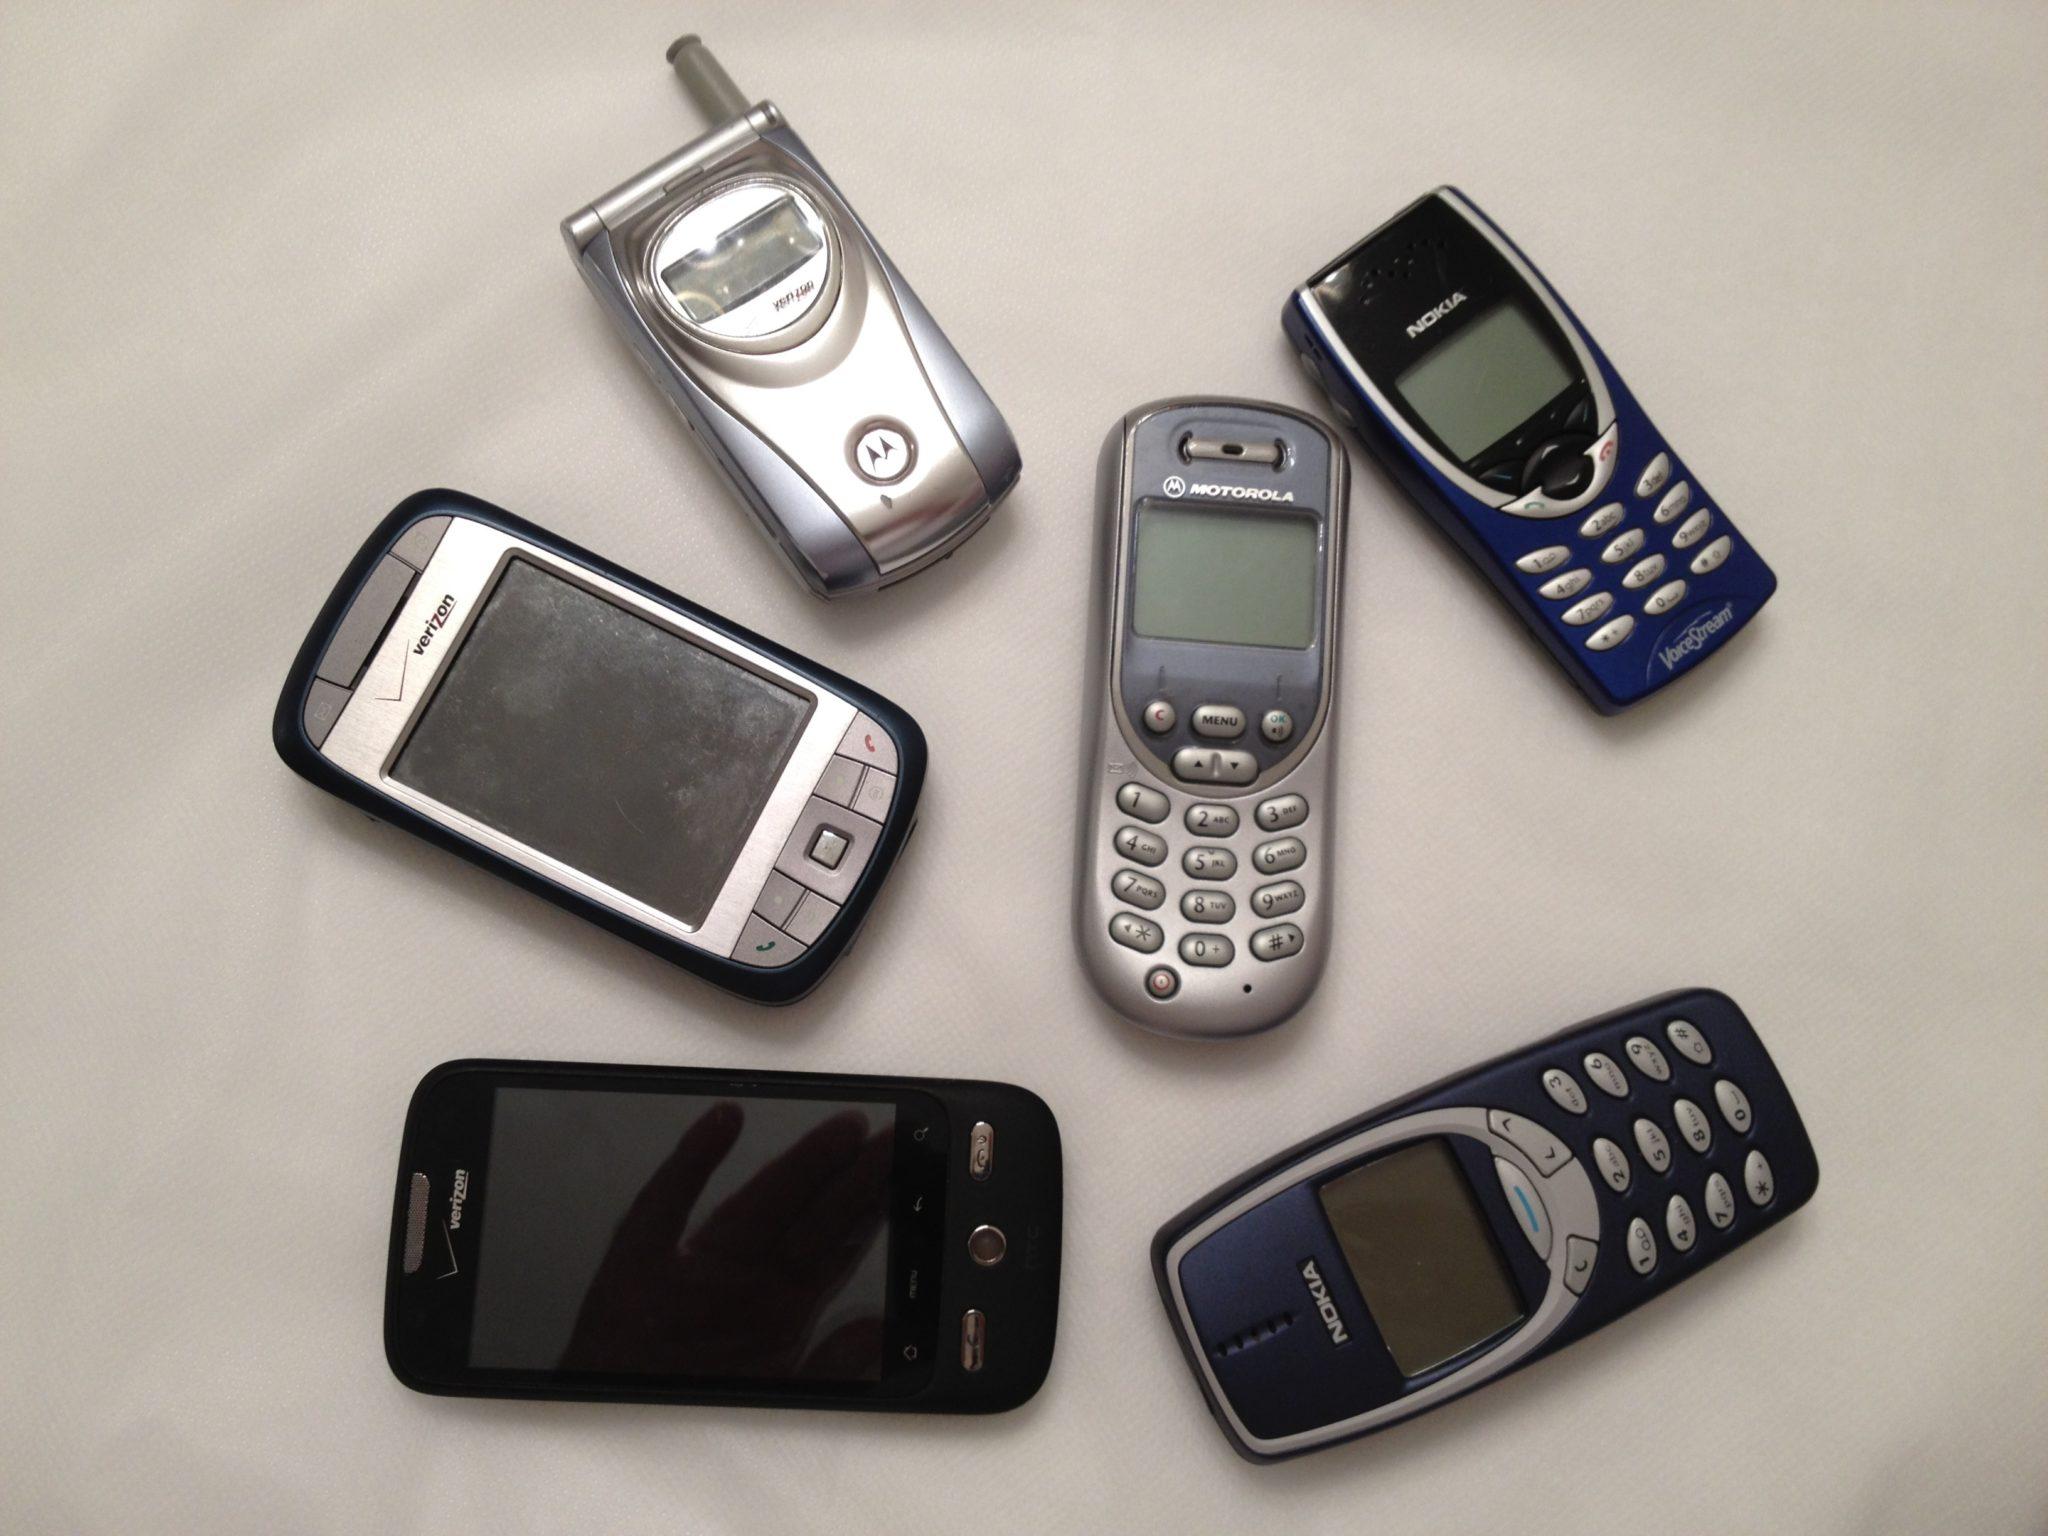 Japonia przerobi stare telefony na medale olimpijskie ...